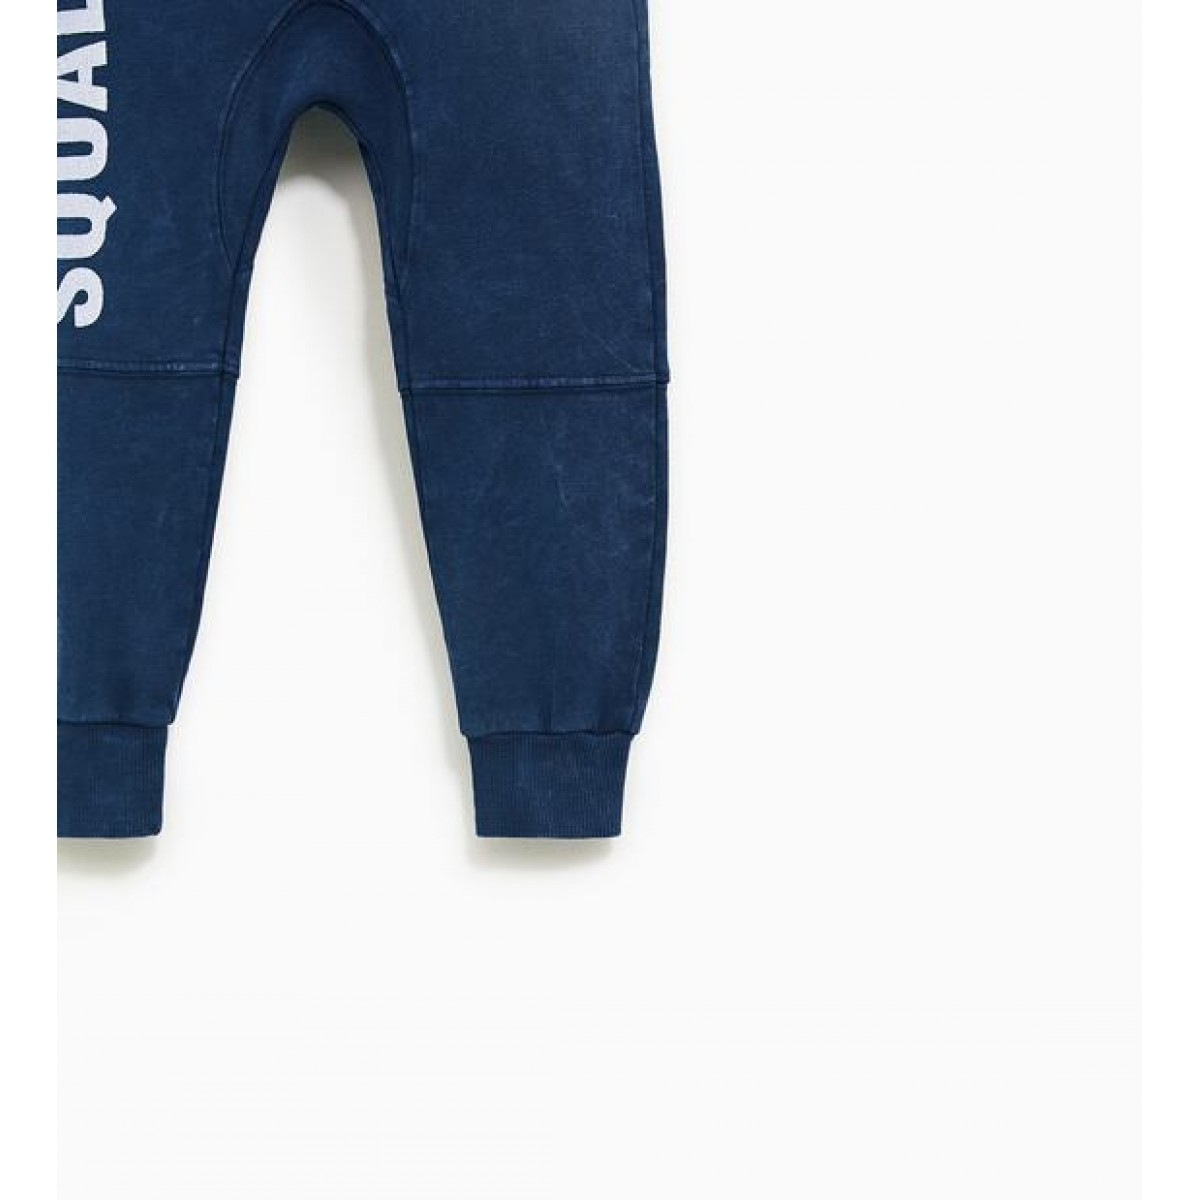 Zara Plush Jersey Jogging Trousers